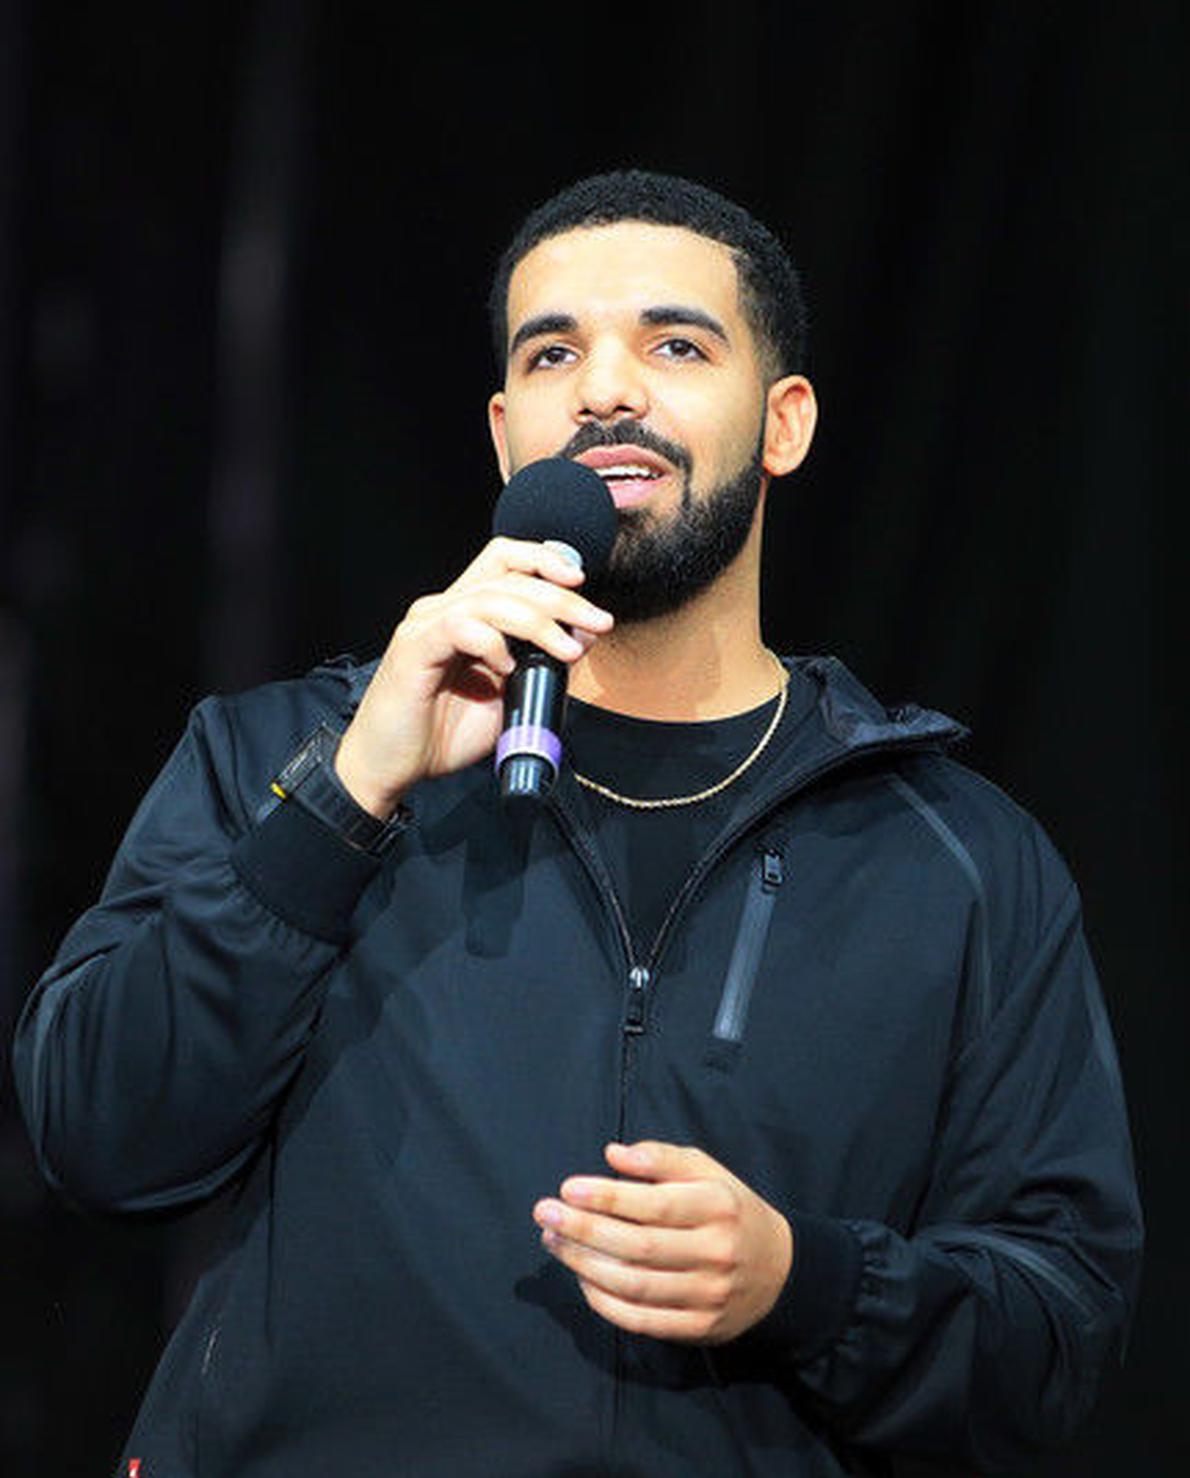 Drake出席格莱美 获奖感言疑似被切断换成广告